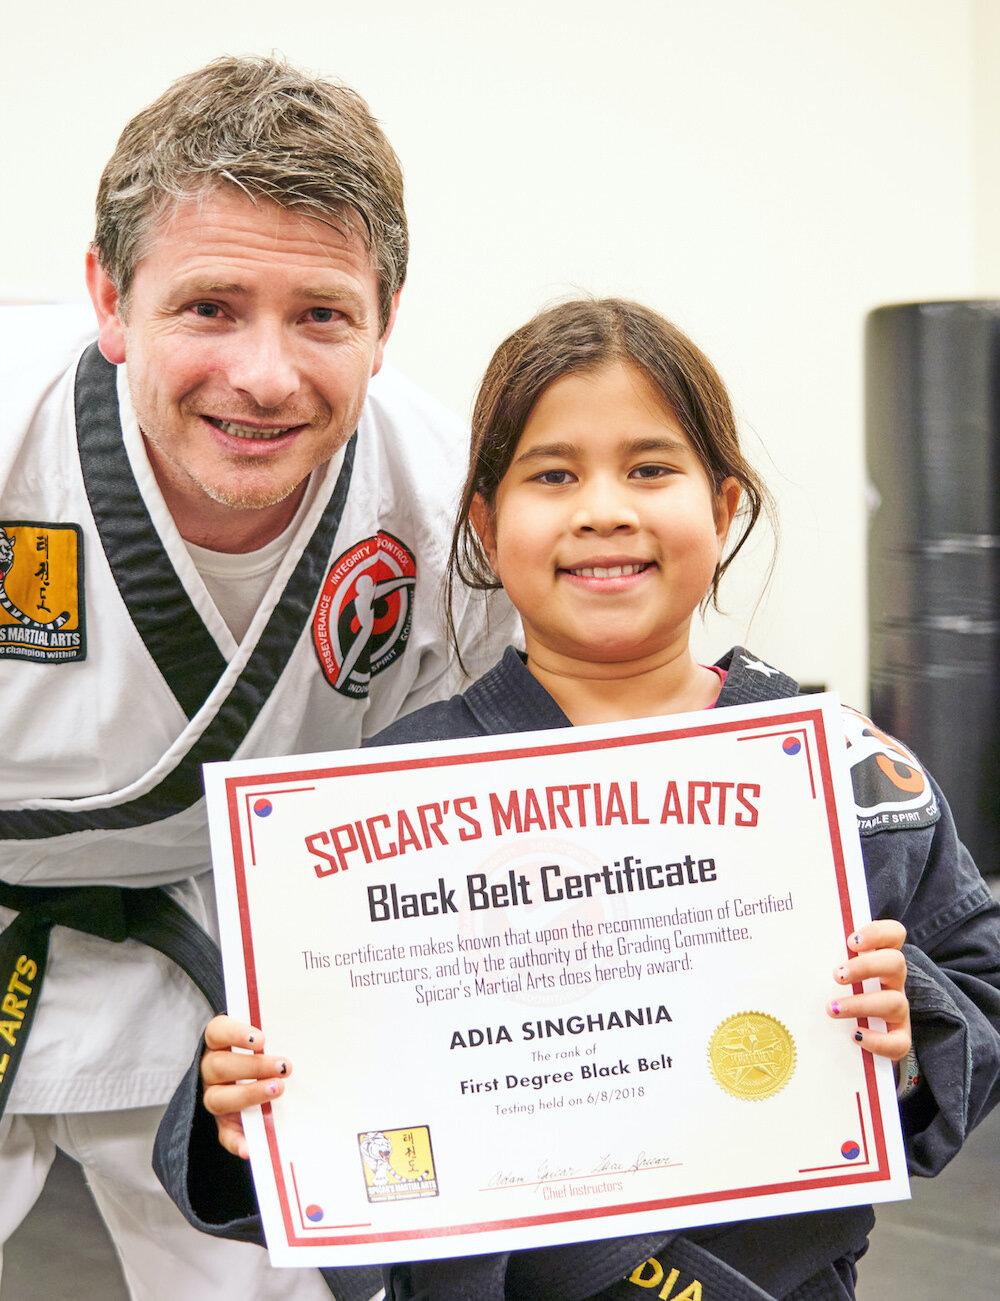 Vs belts karate taekwondo A beginner's